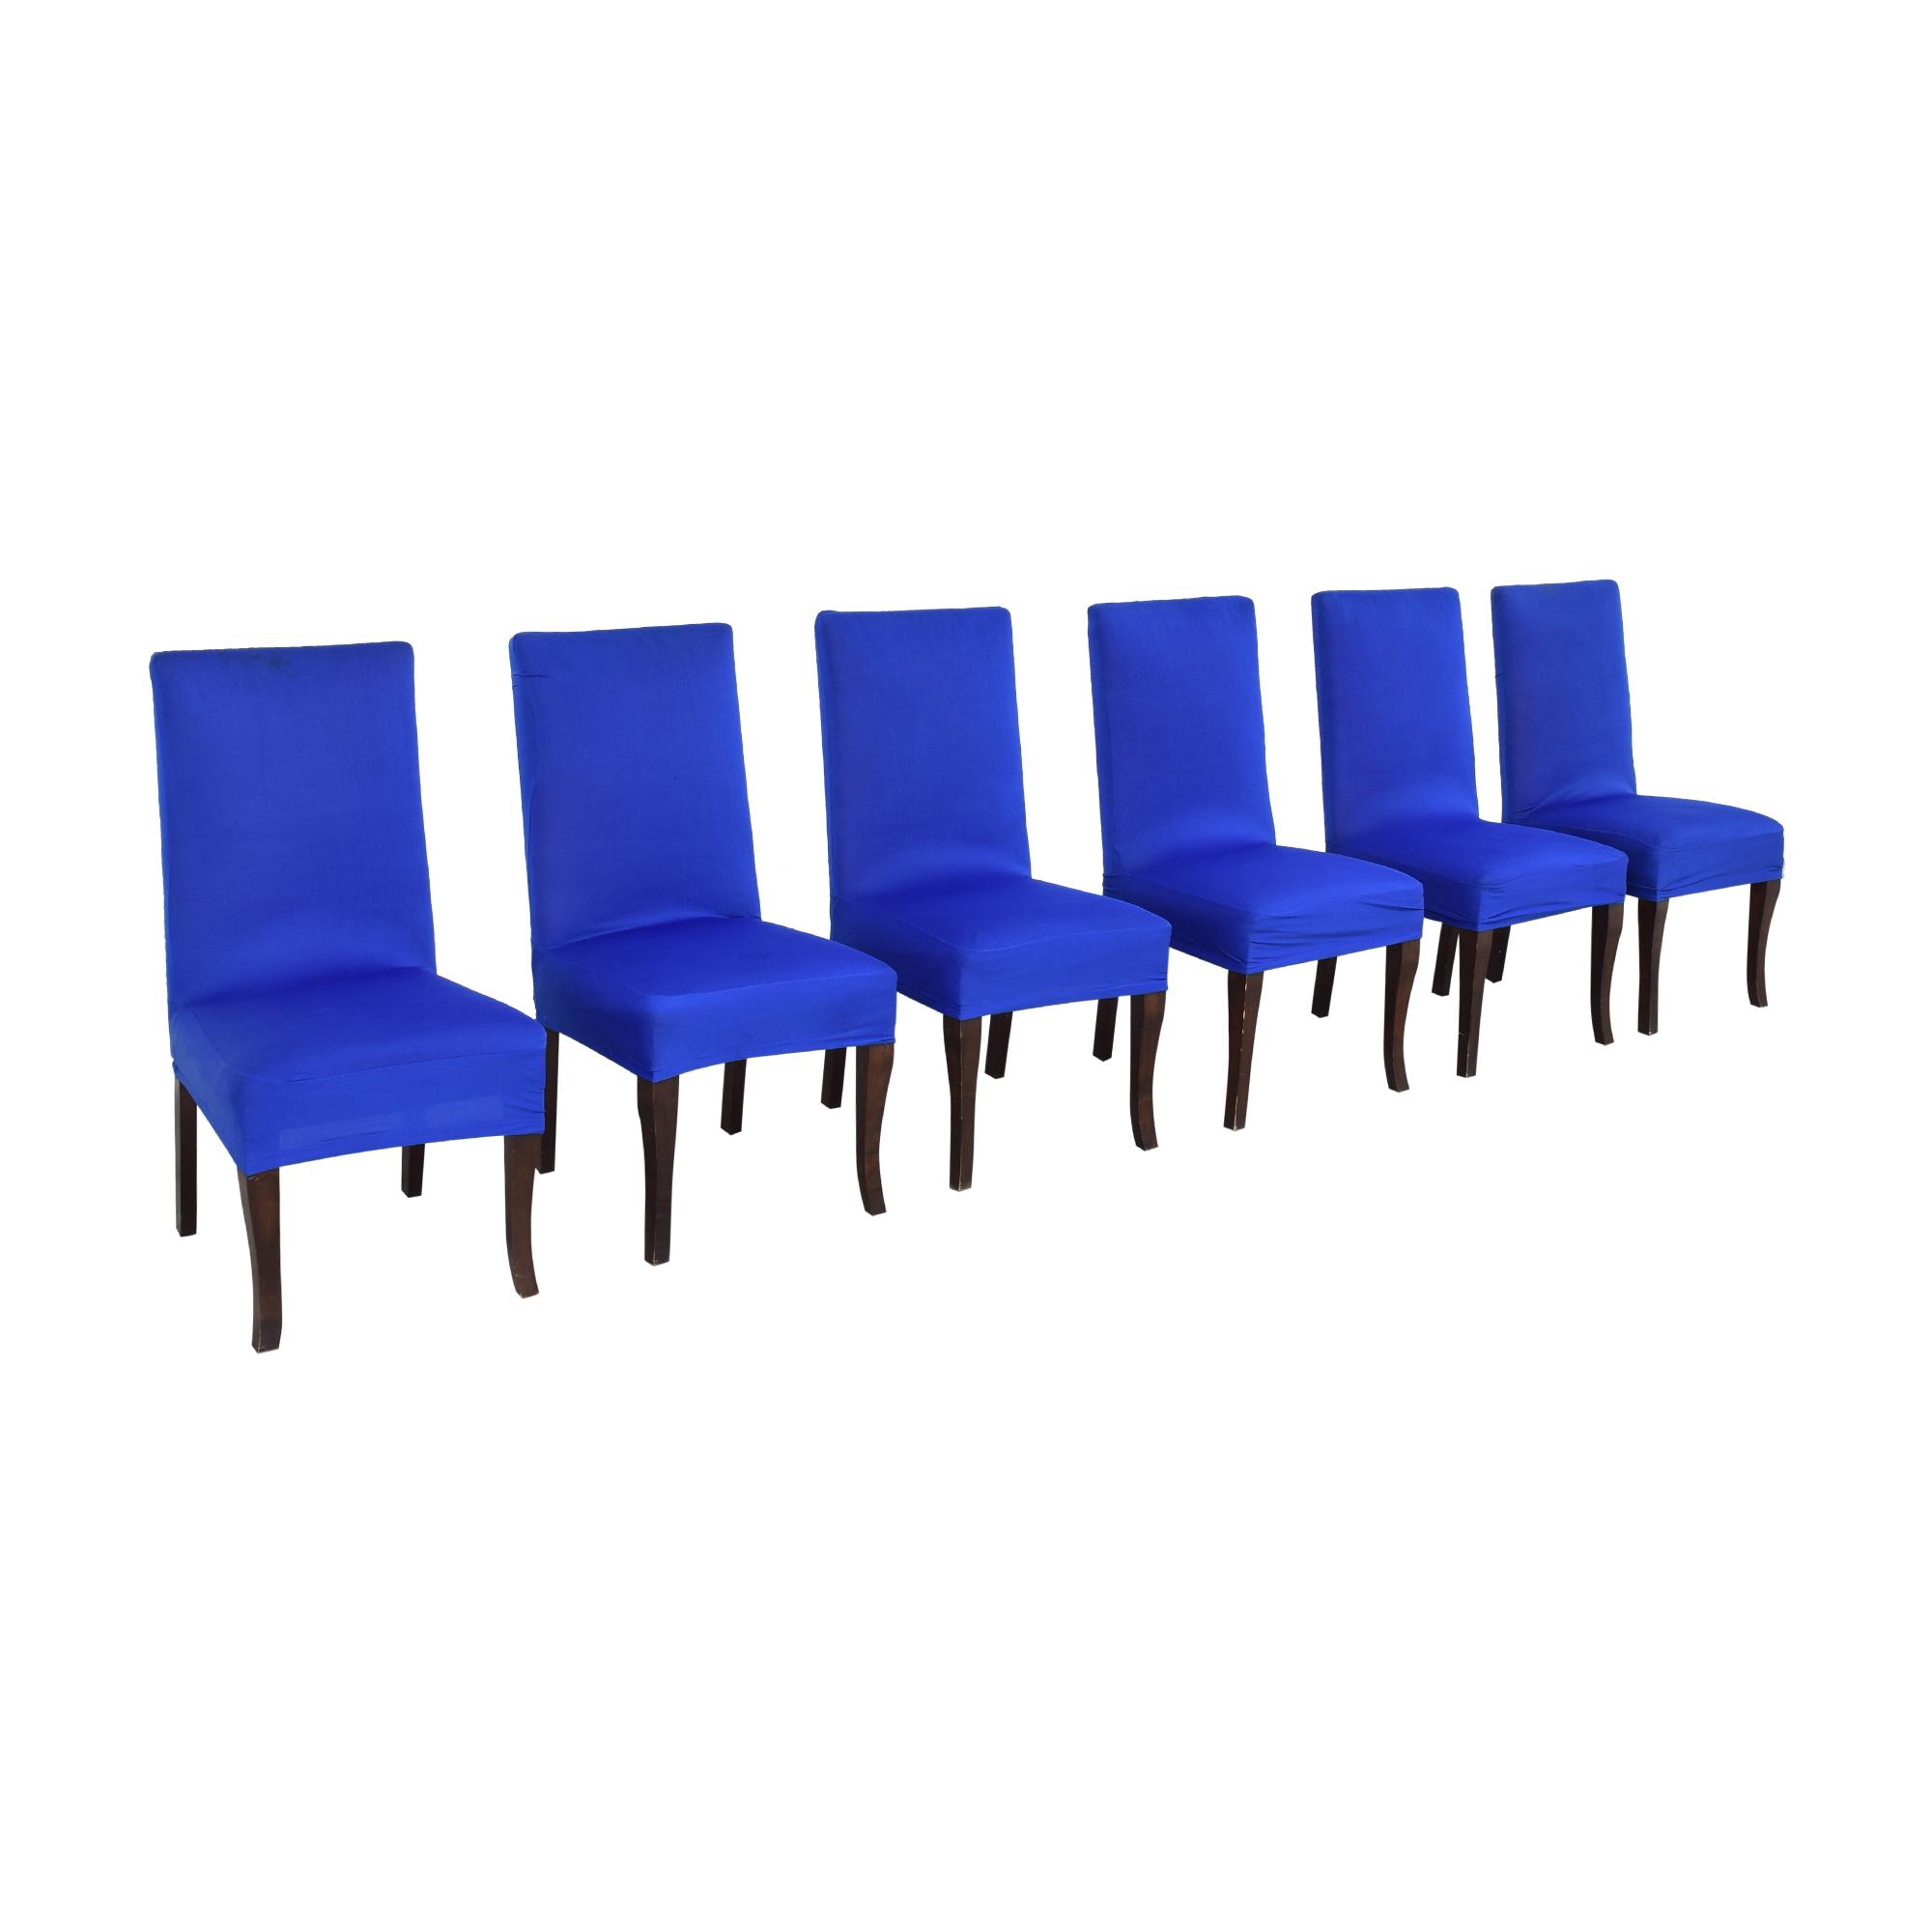 Ballard Designs Ballard Designs Upholstered Couture Chairs nyc